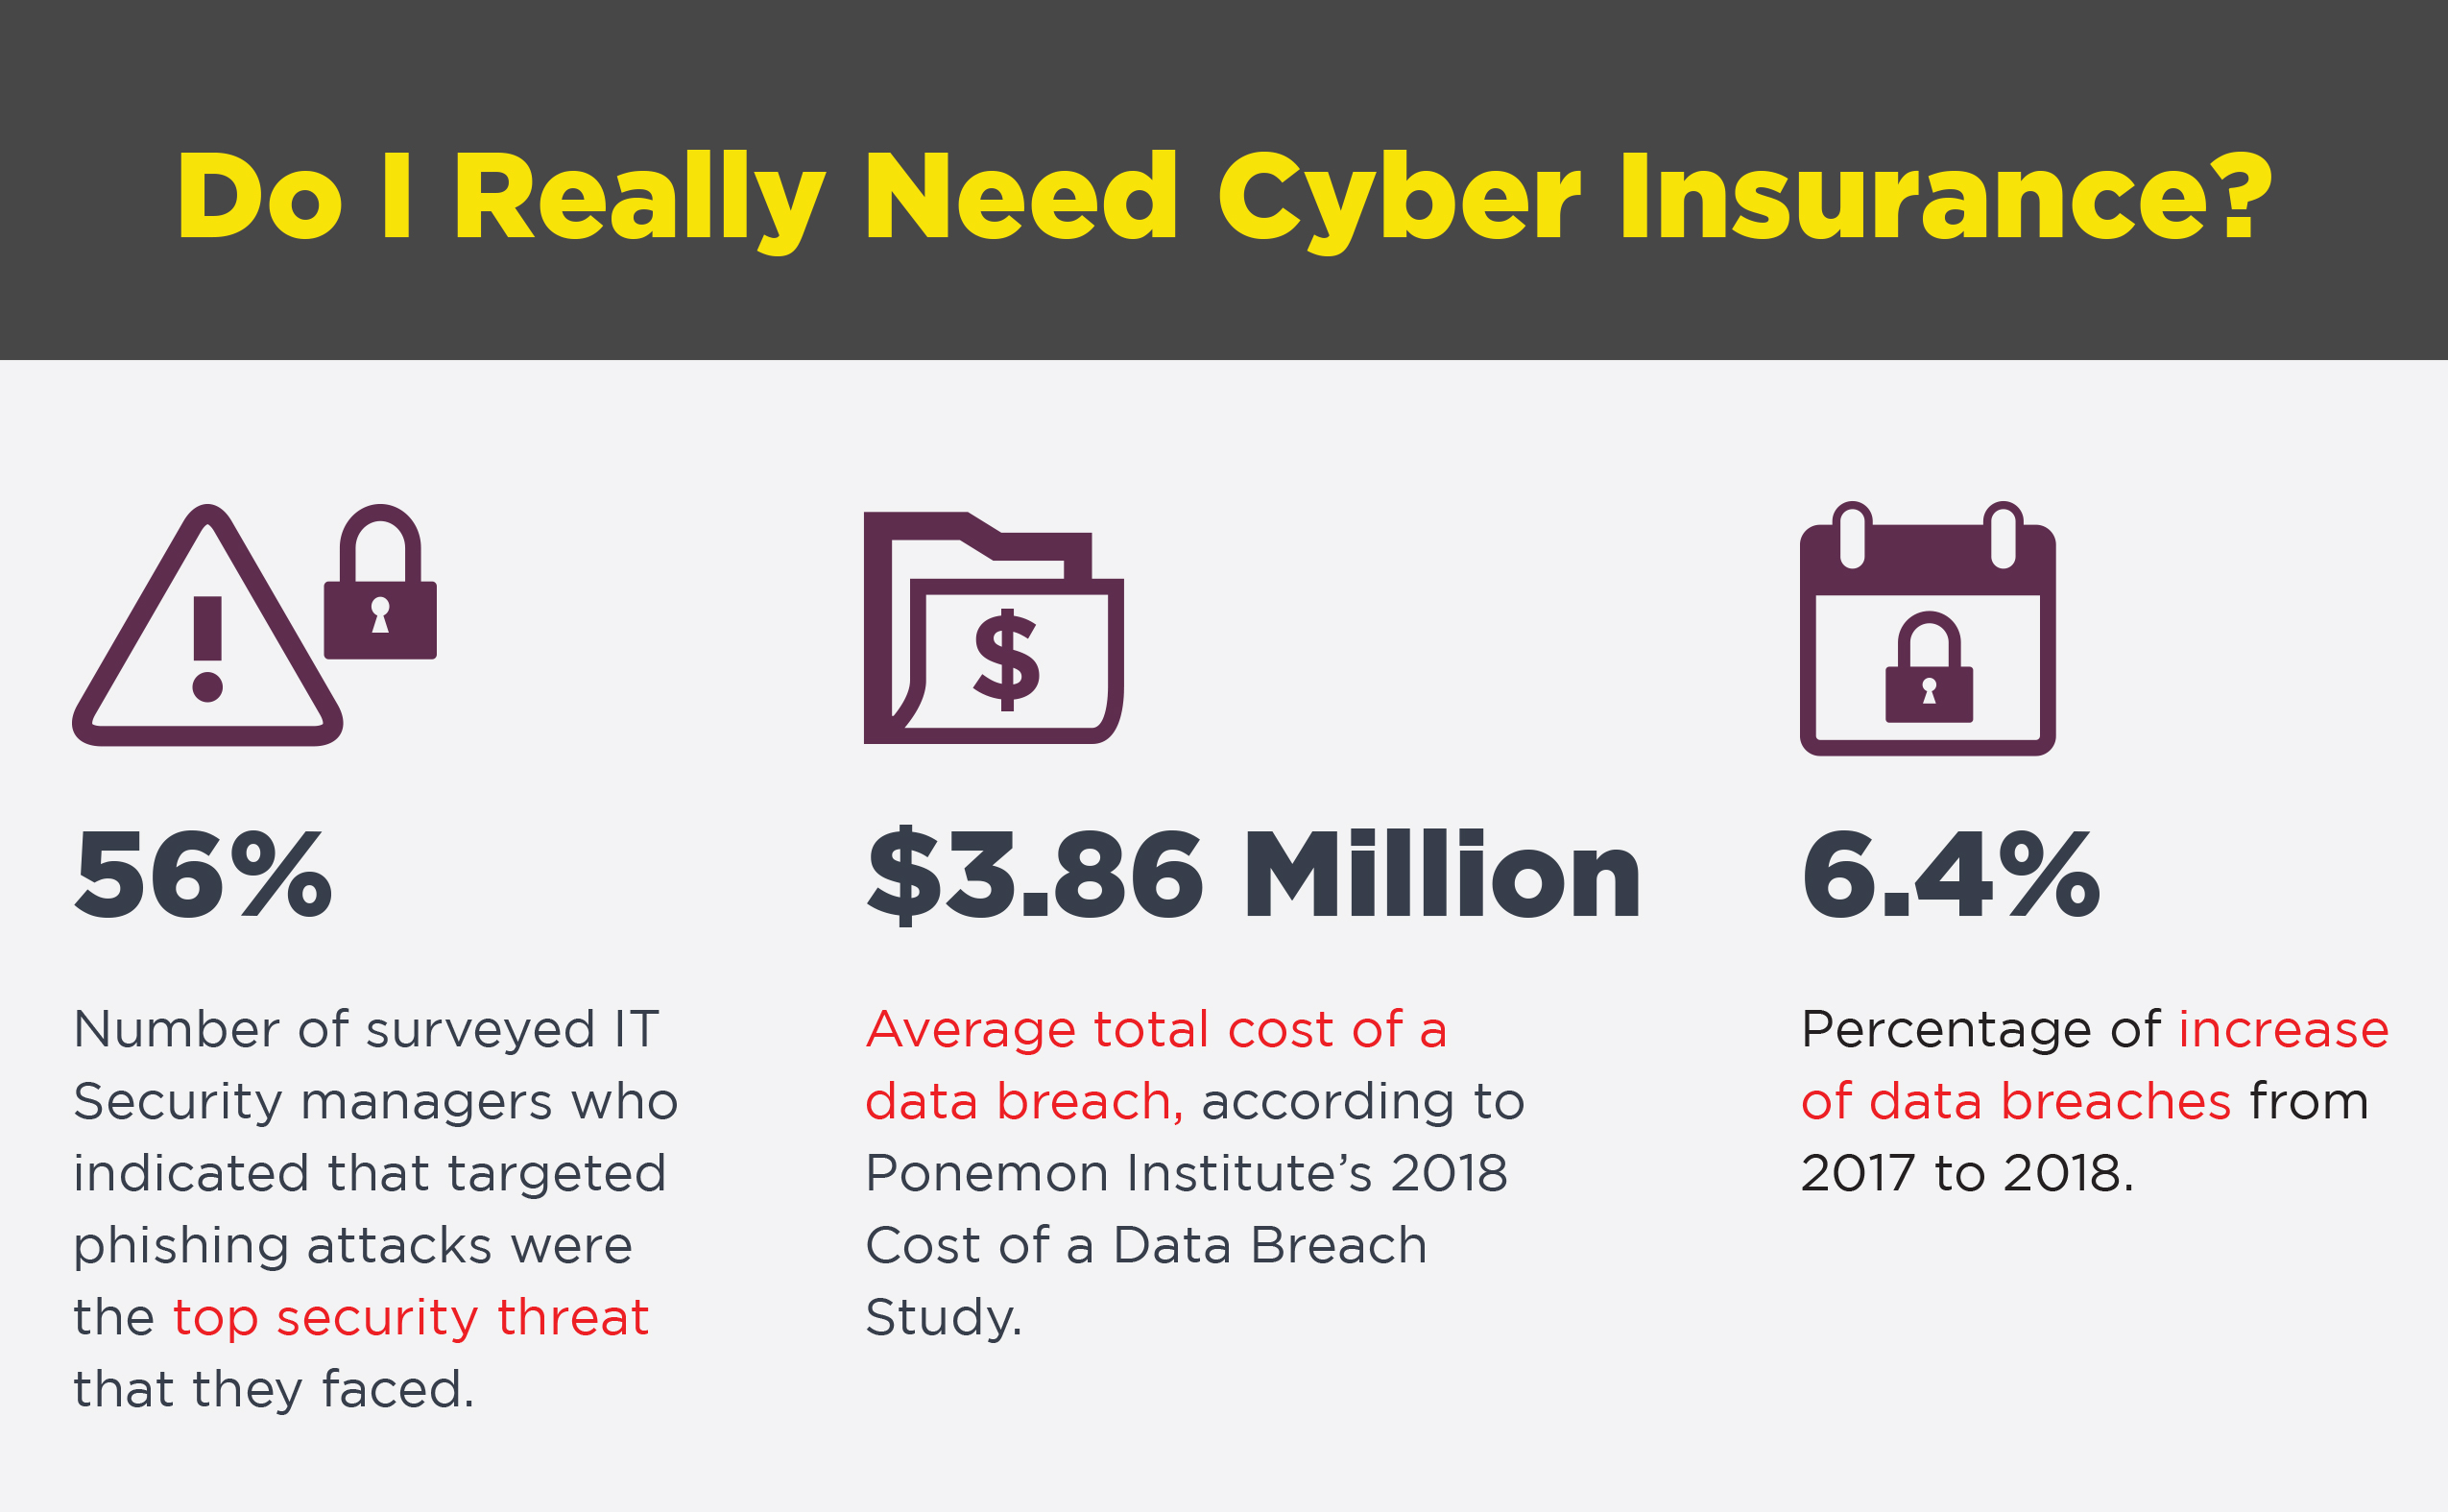 Cyber Insurance importance